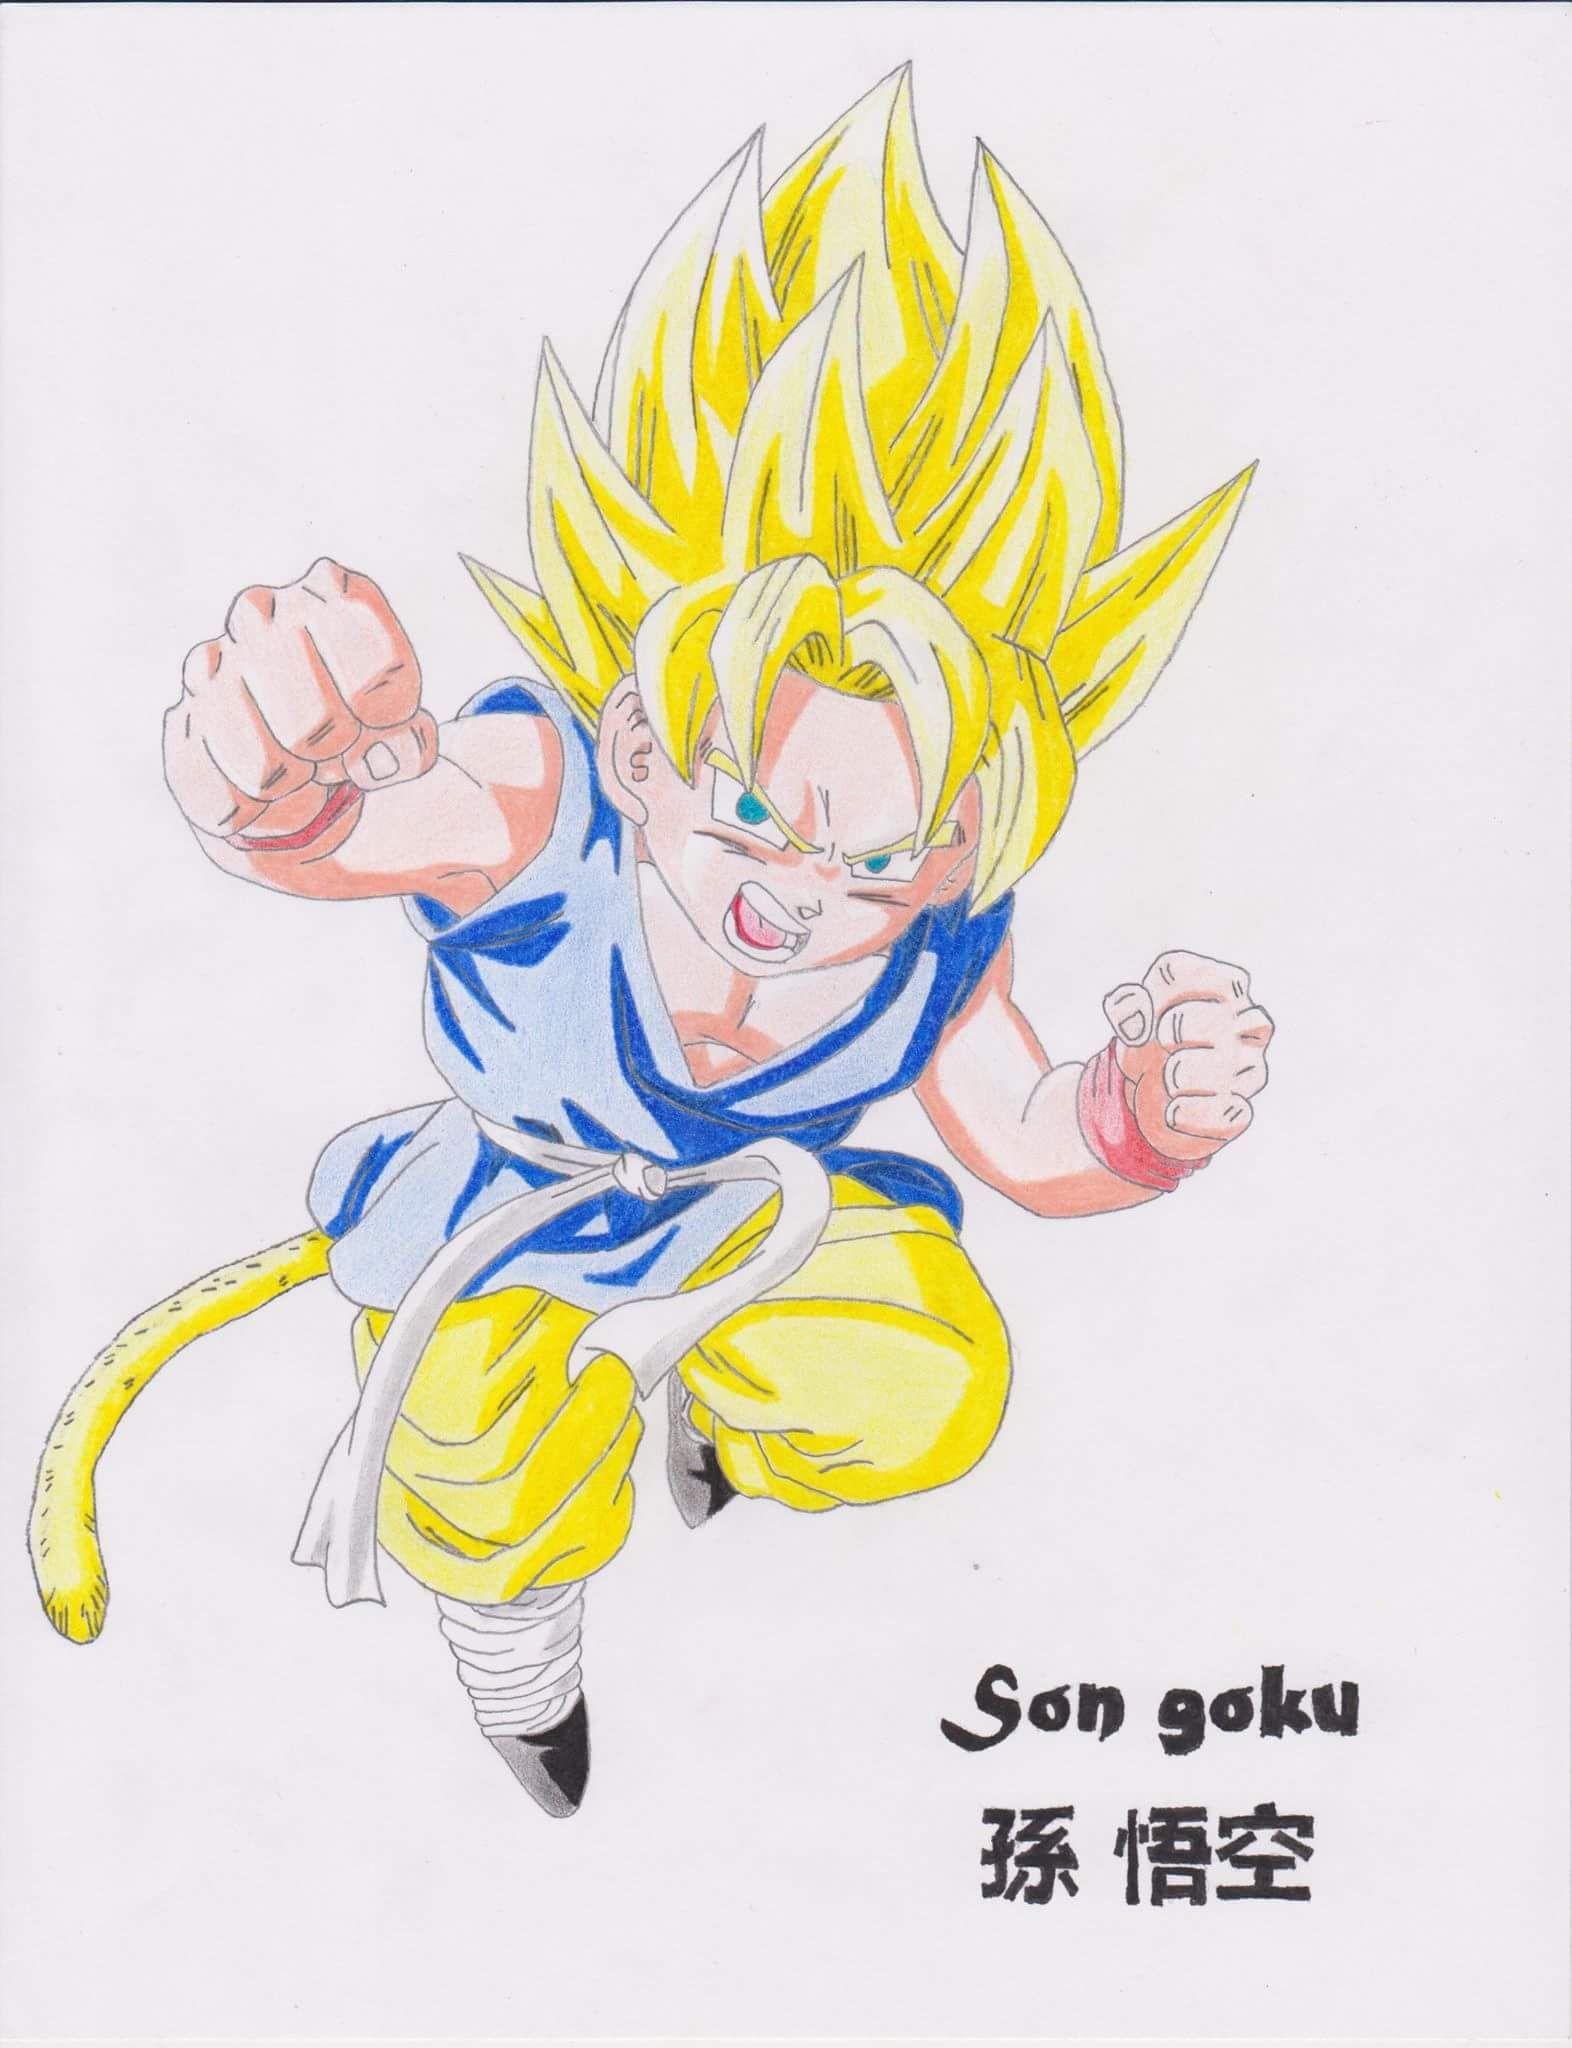 Son Goku - 孫 悟空 Anime  Dragon Ball GT